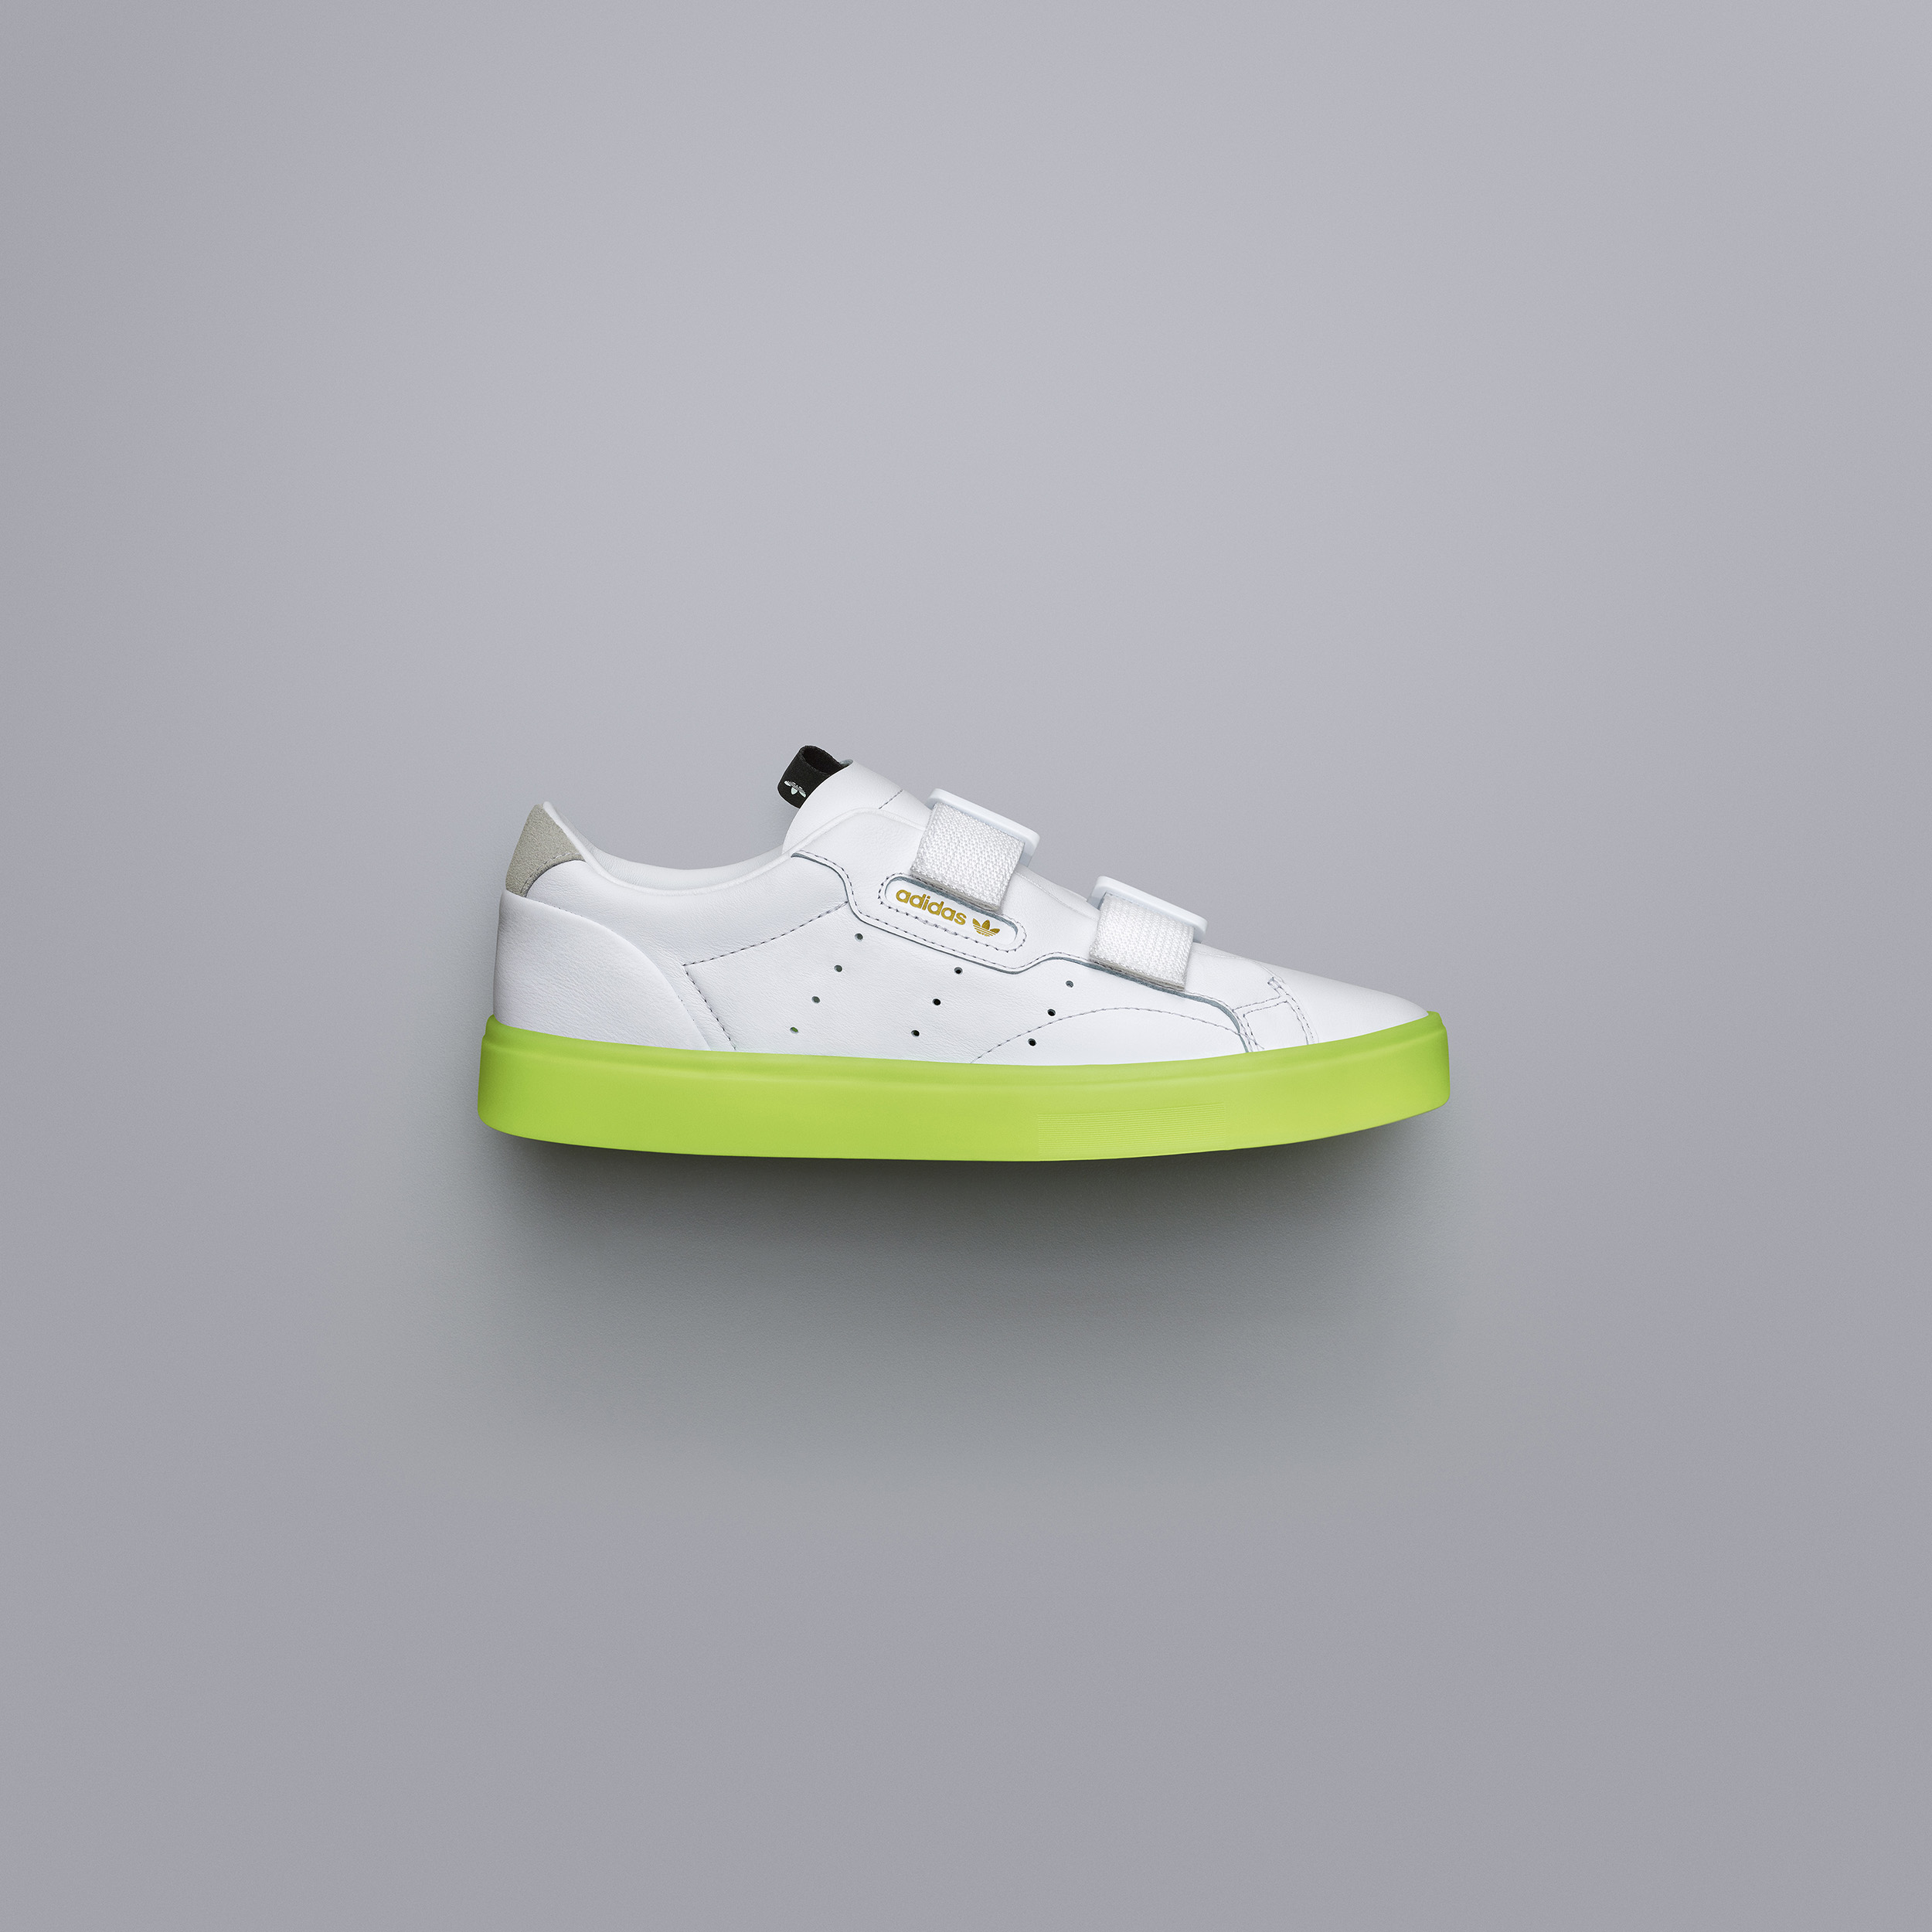 adidasOriginals SS19 Sleek SleekSW EE8279 01 Angle COMP c